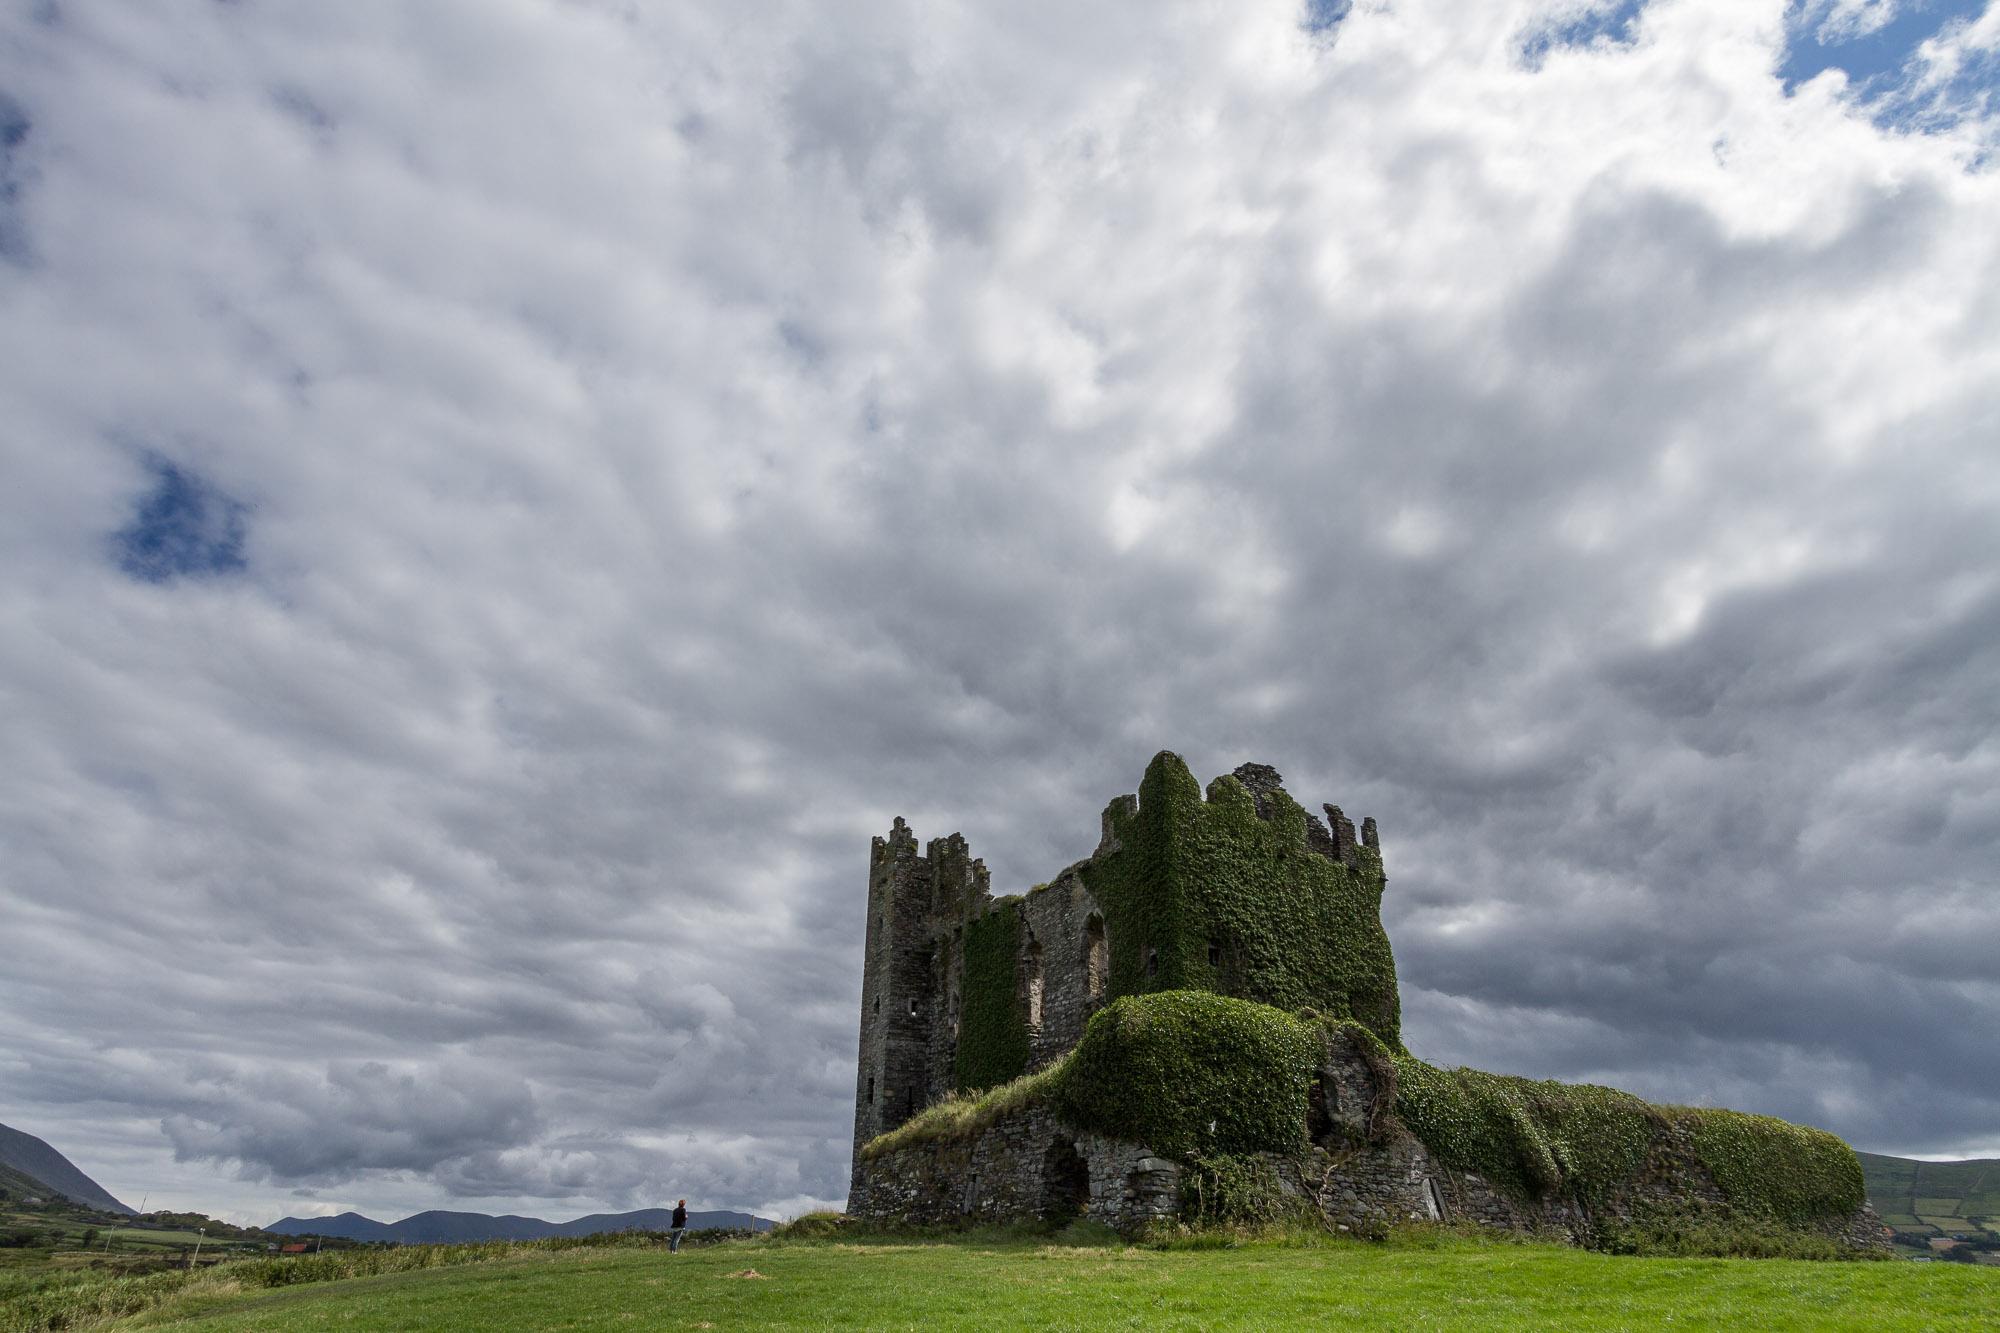 Ballicarbery Castle